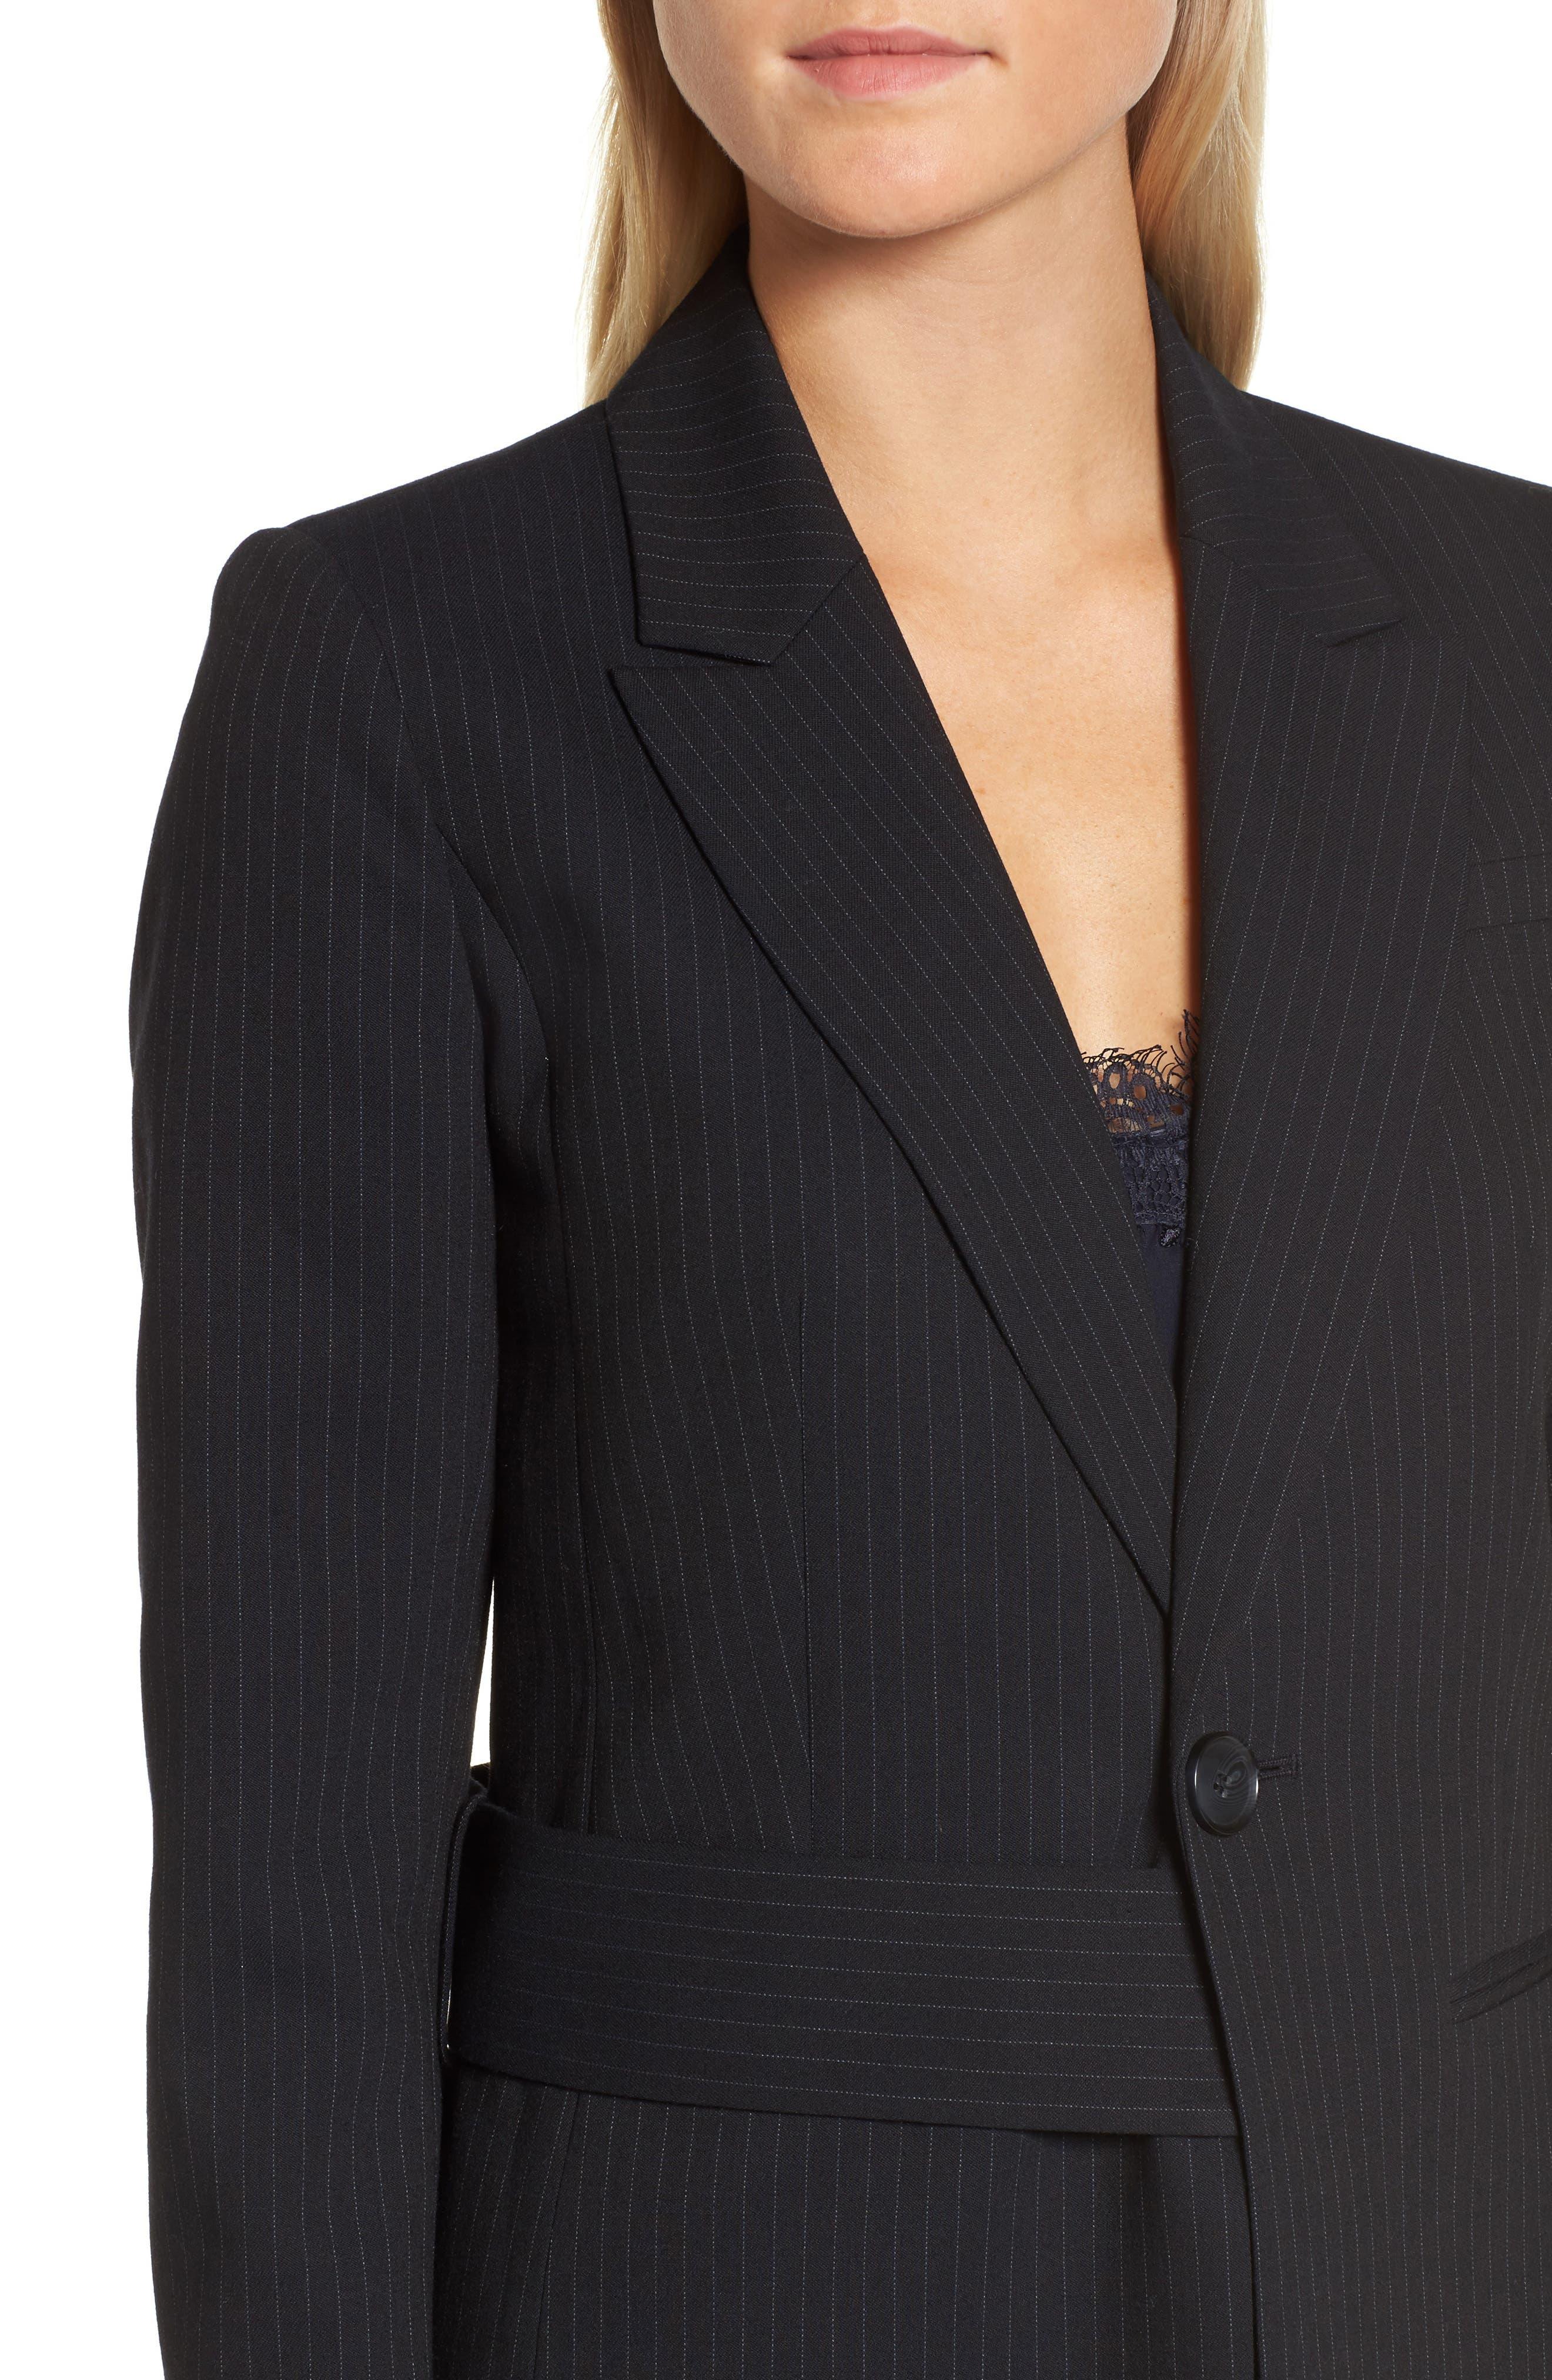 Pinstripe Suit Jacket,                             Alternate thumbnail 5, color,                             Navy Night Pinstripe